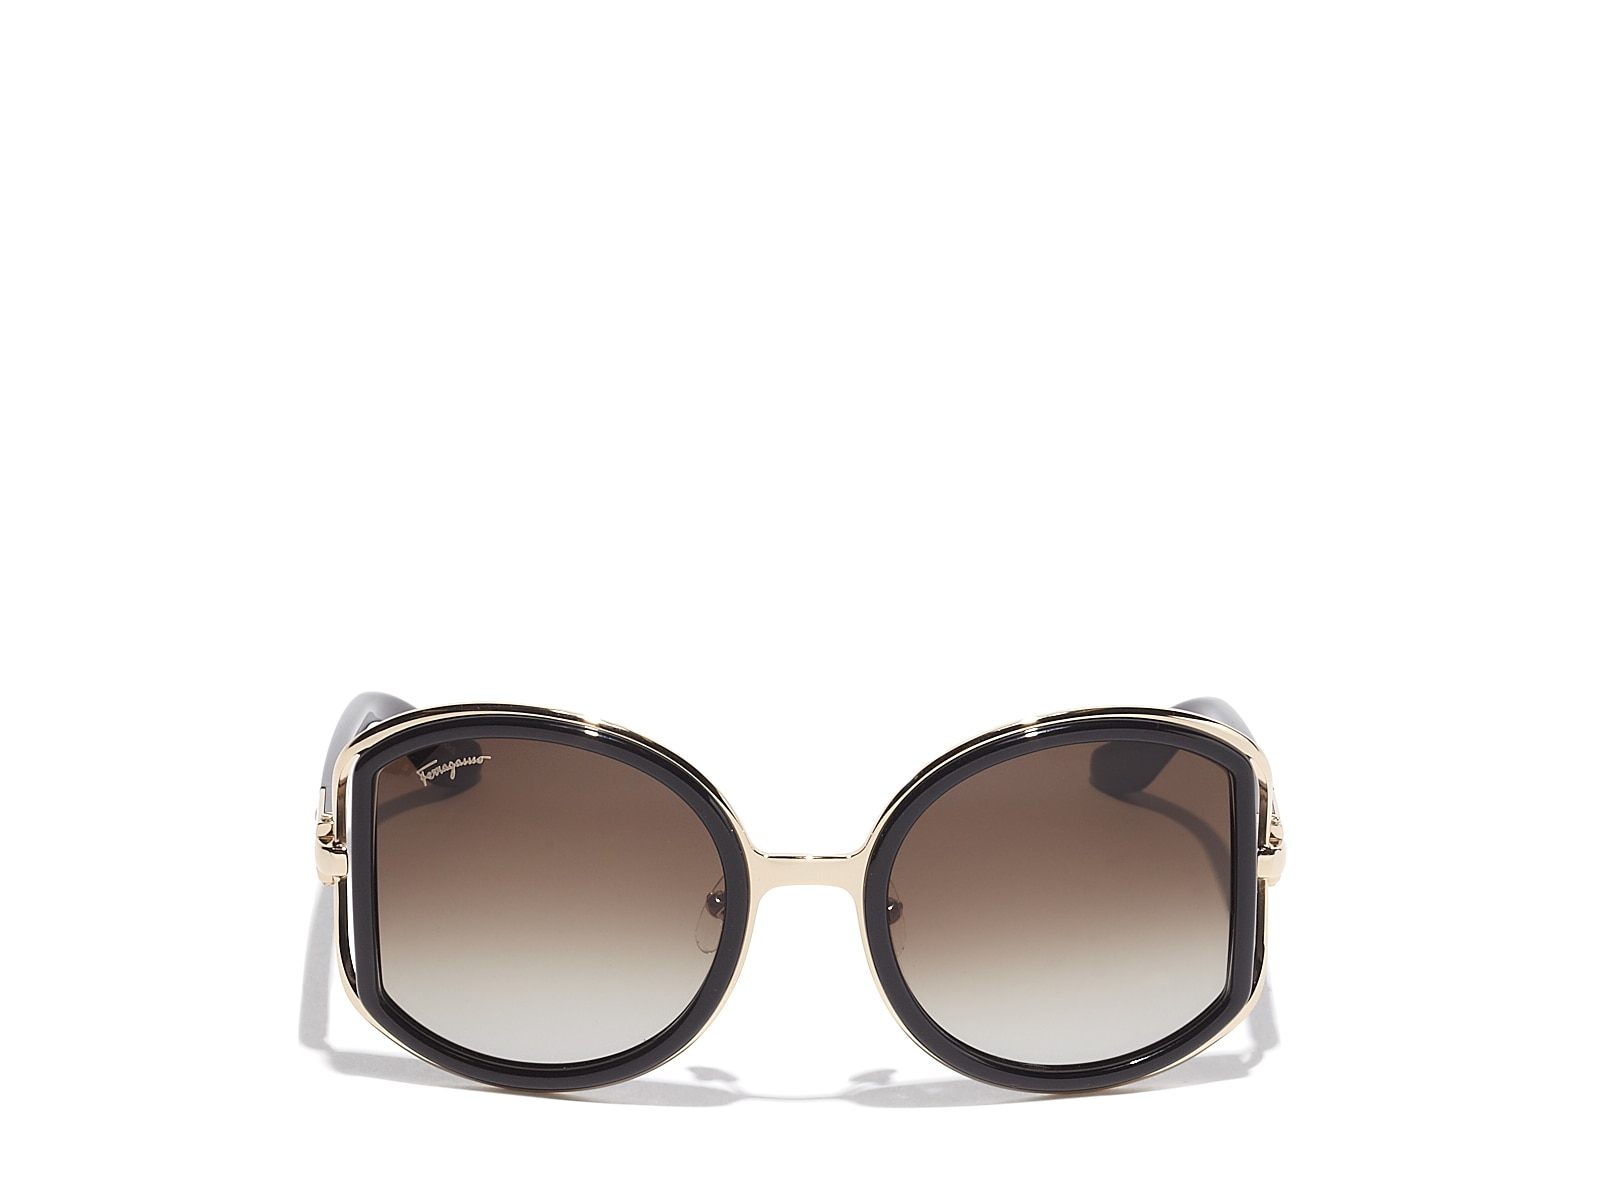 Buckle Sunglasses  salvatore ferragamo buckle sunglasses eyewear women